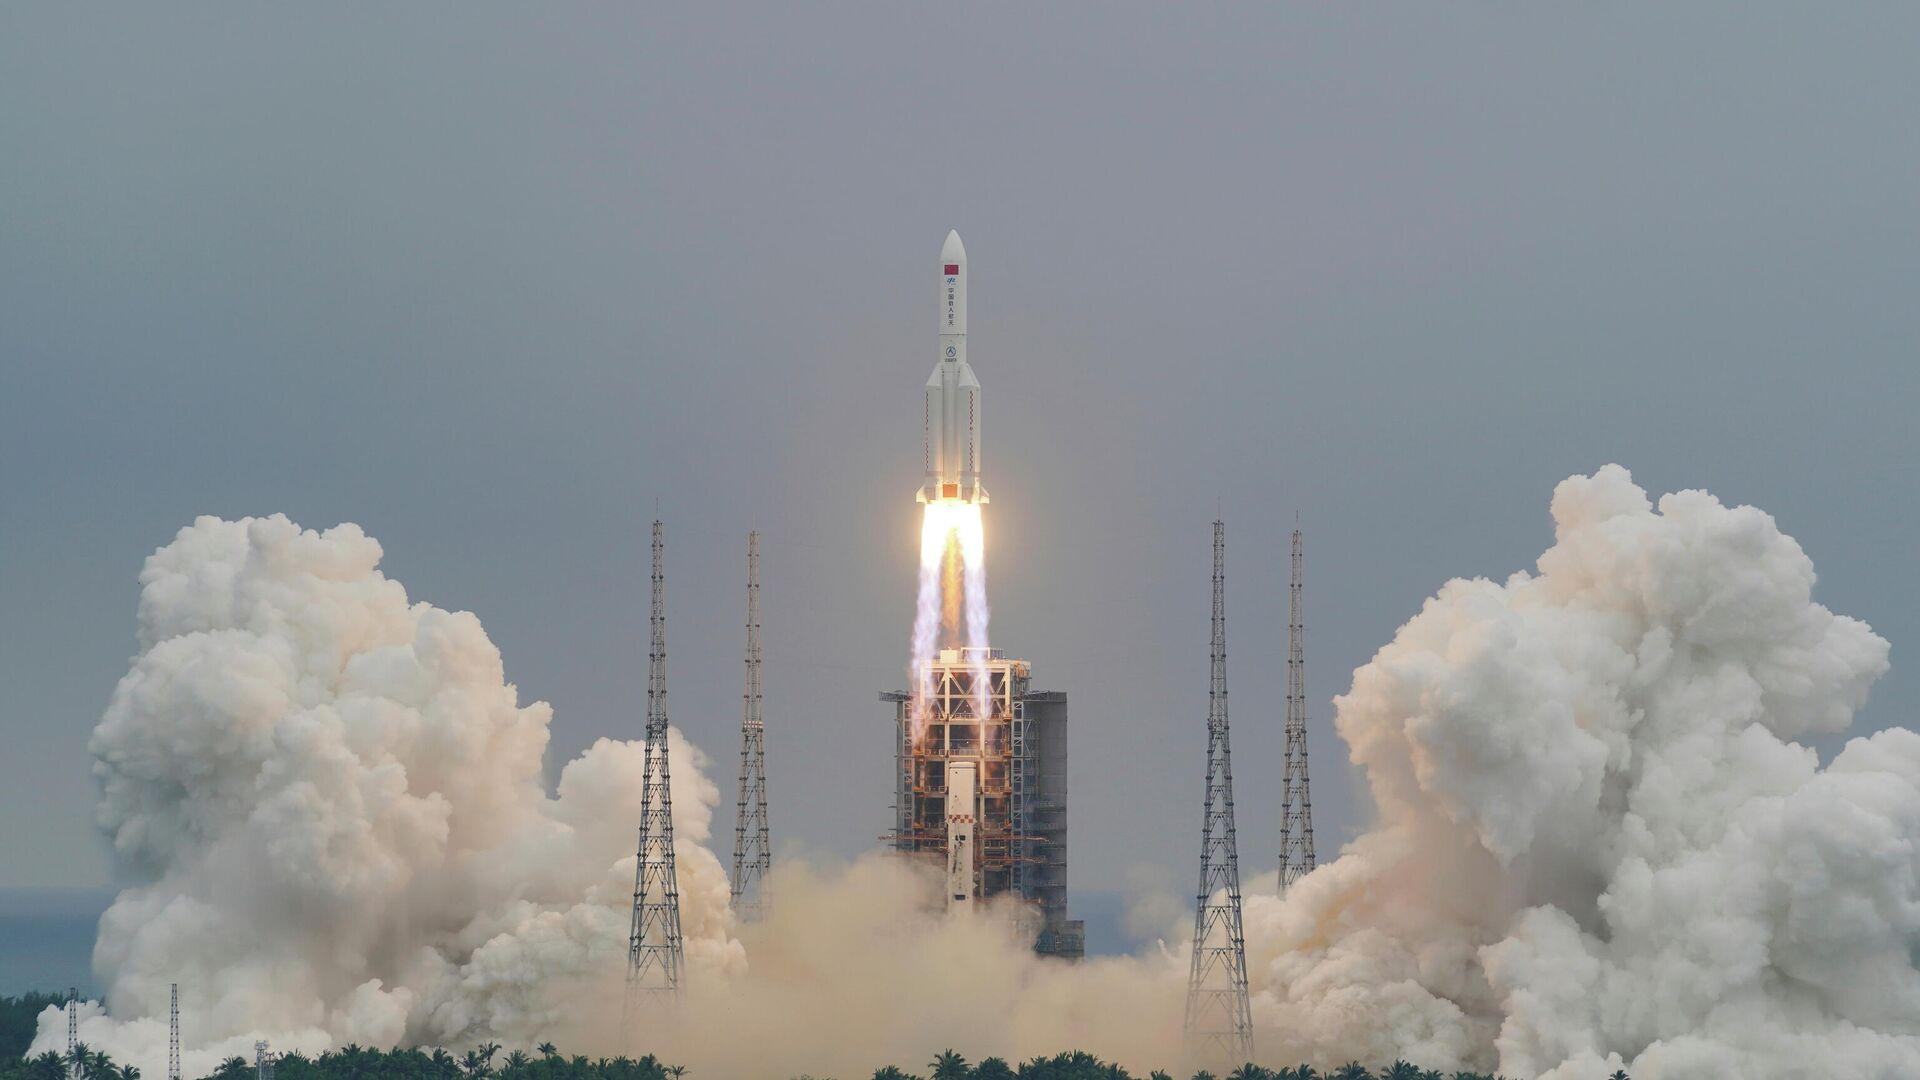 Cohete chino Long March 5B - Sputnik Mundo, 1920, 05.05.2021